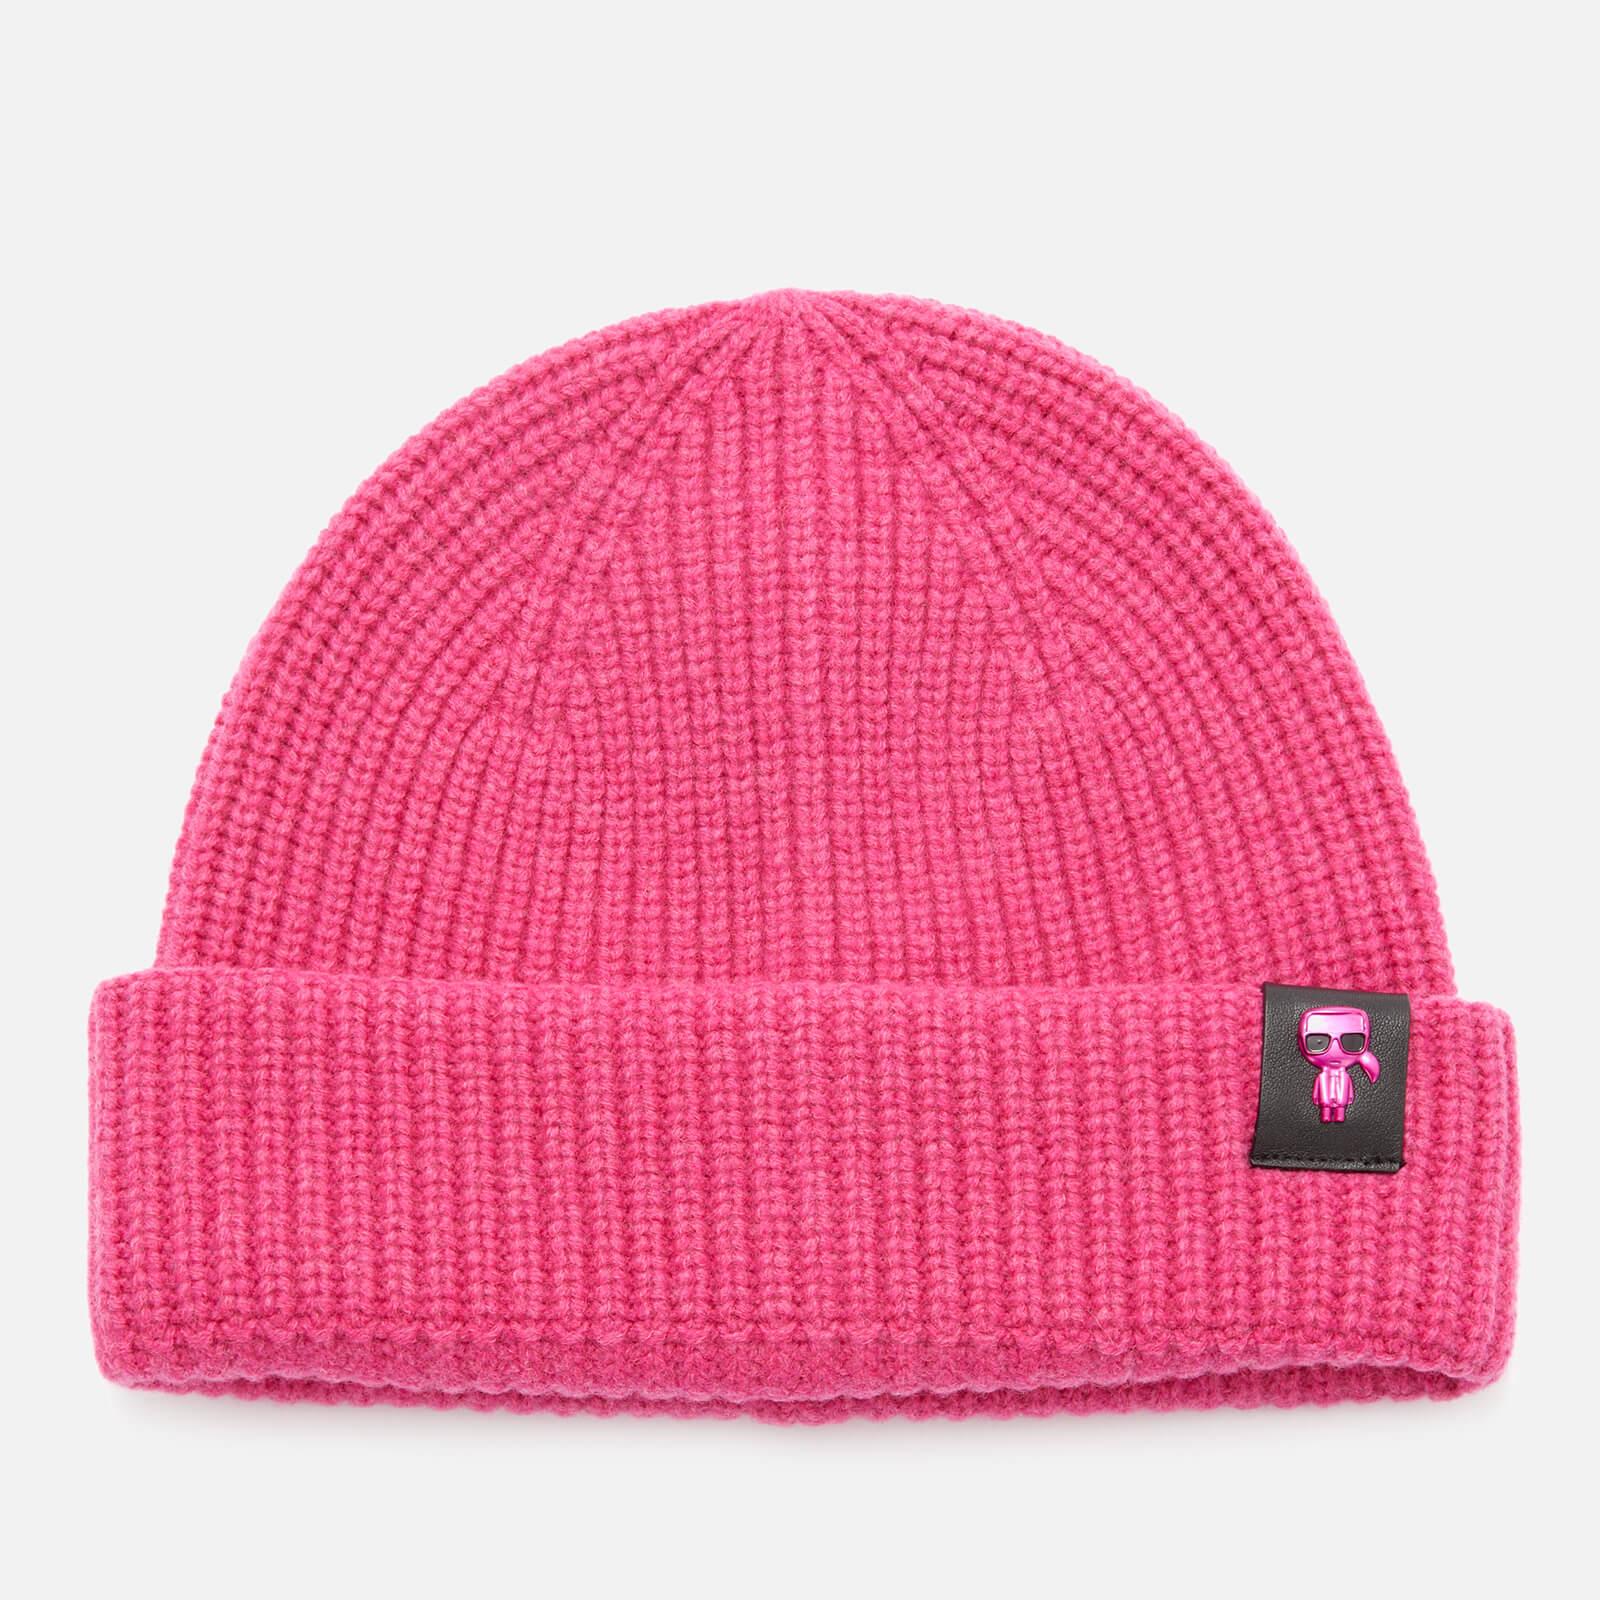 KARL LAGERFELD Women's K/Ikonik 3D Pin Beanie - Pink